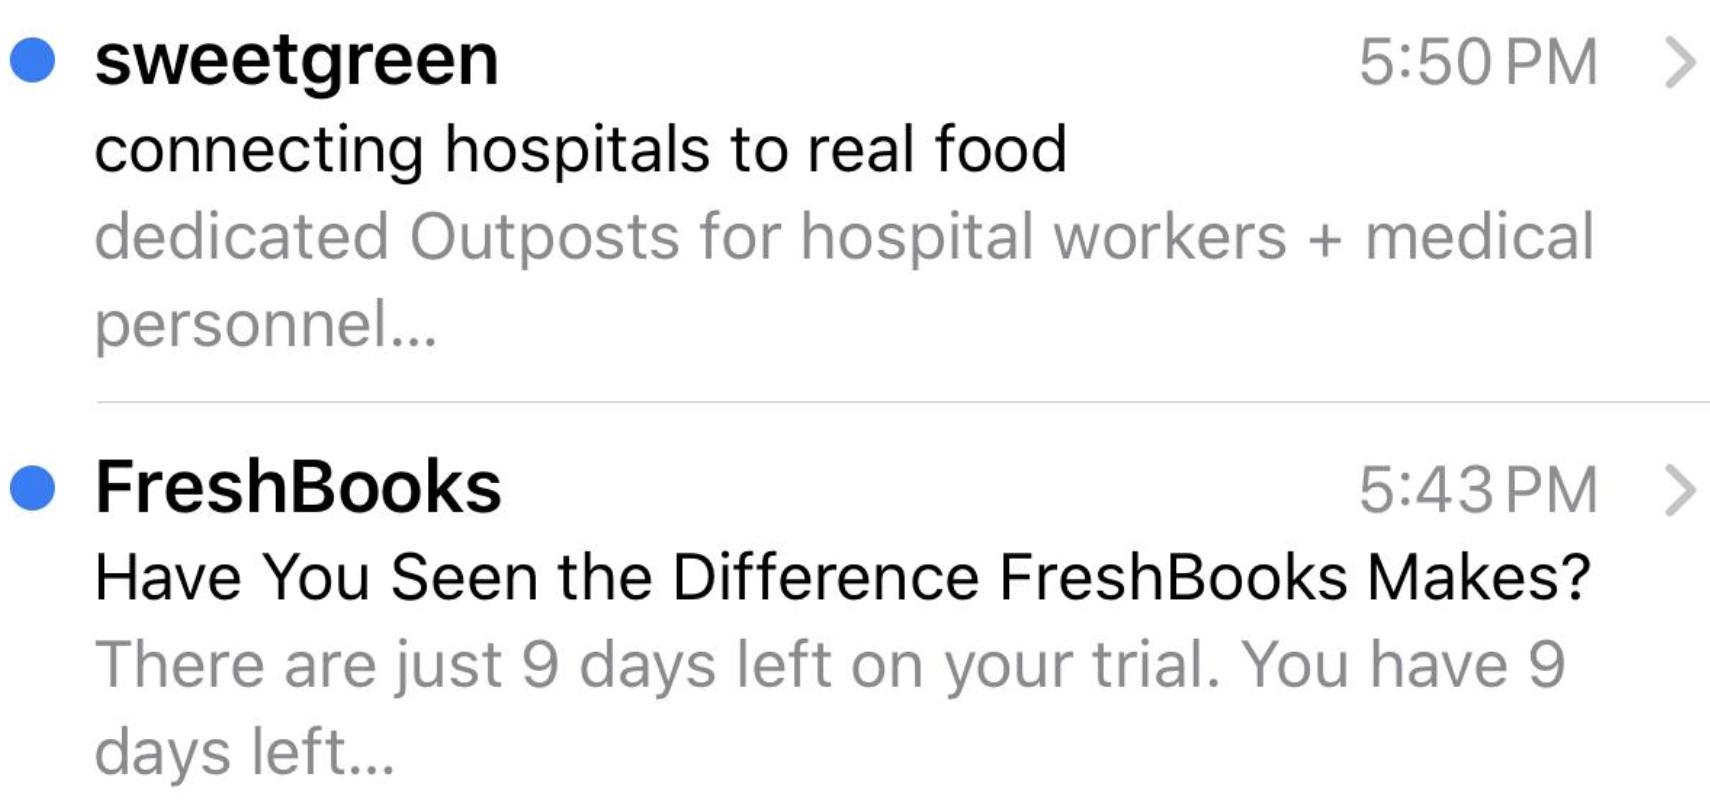 RecurNow-sweetgreen-FreshBooks